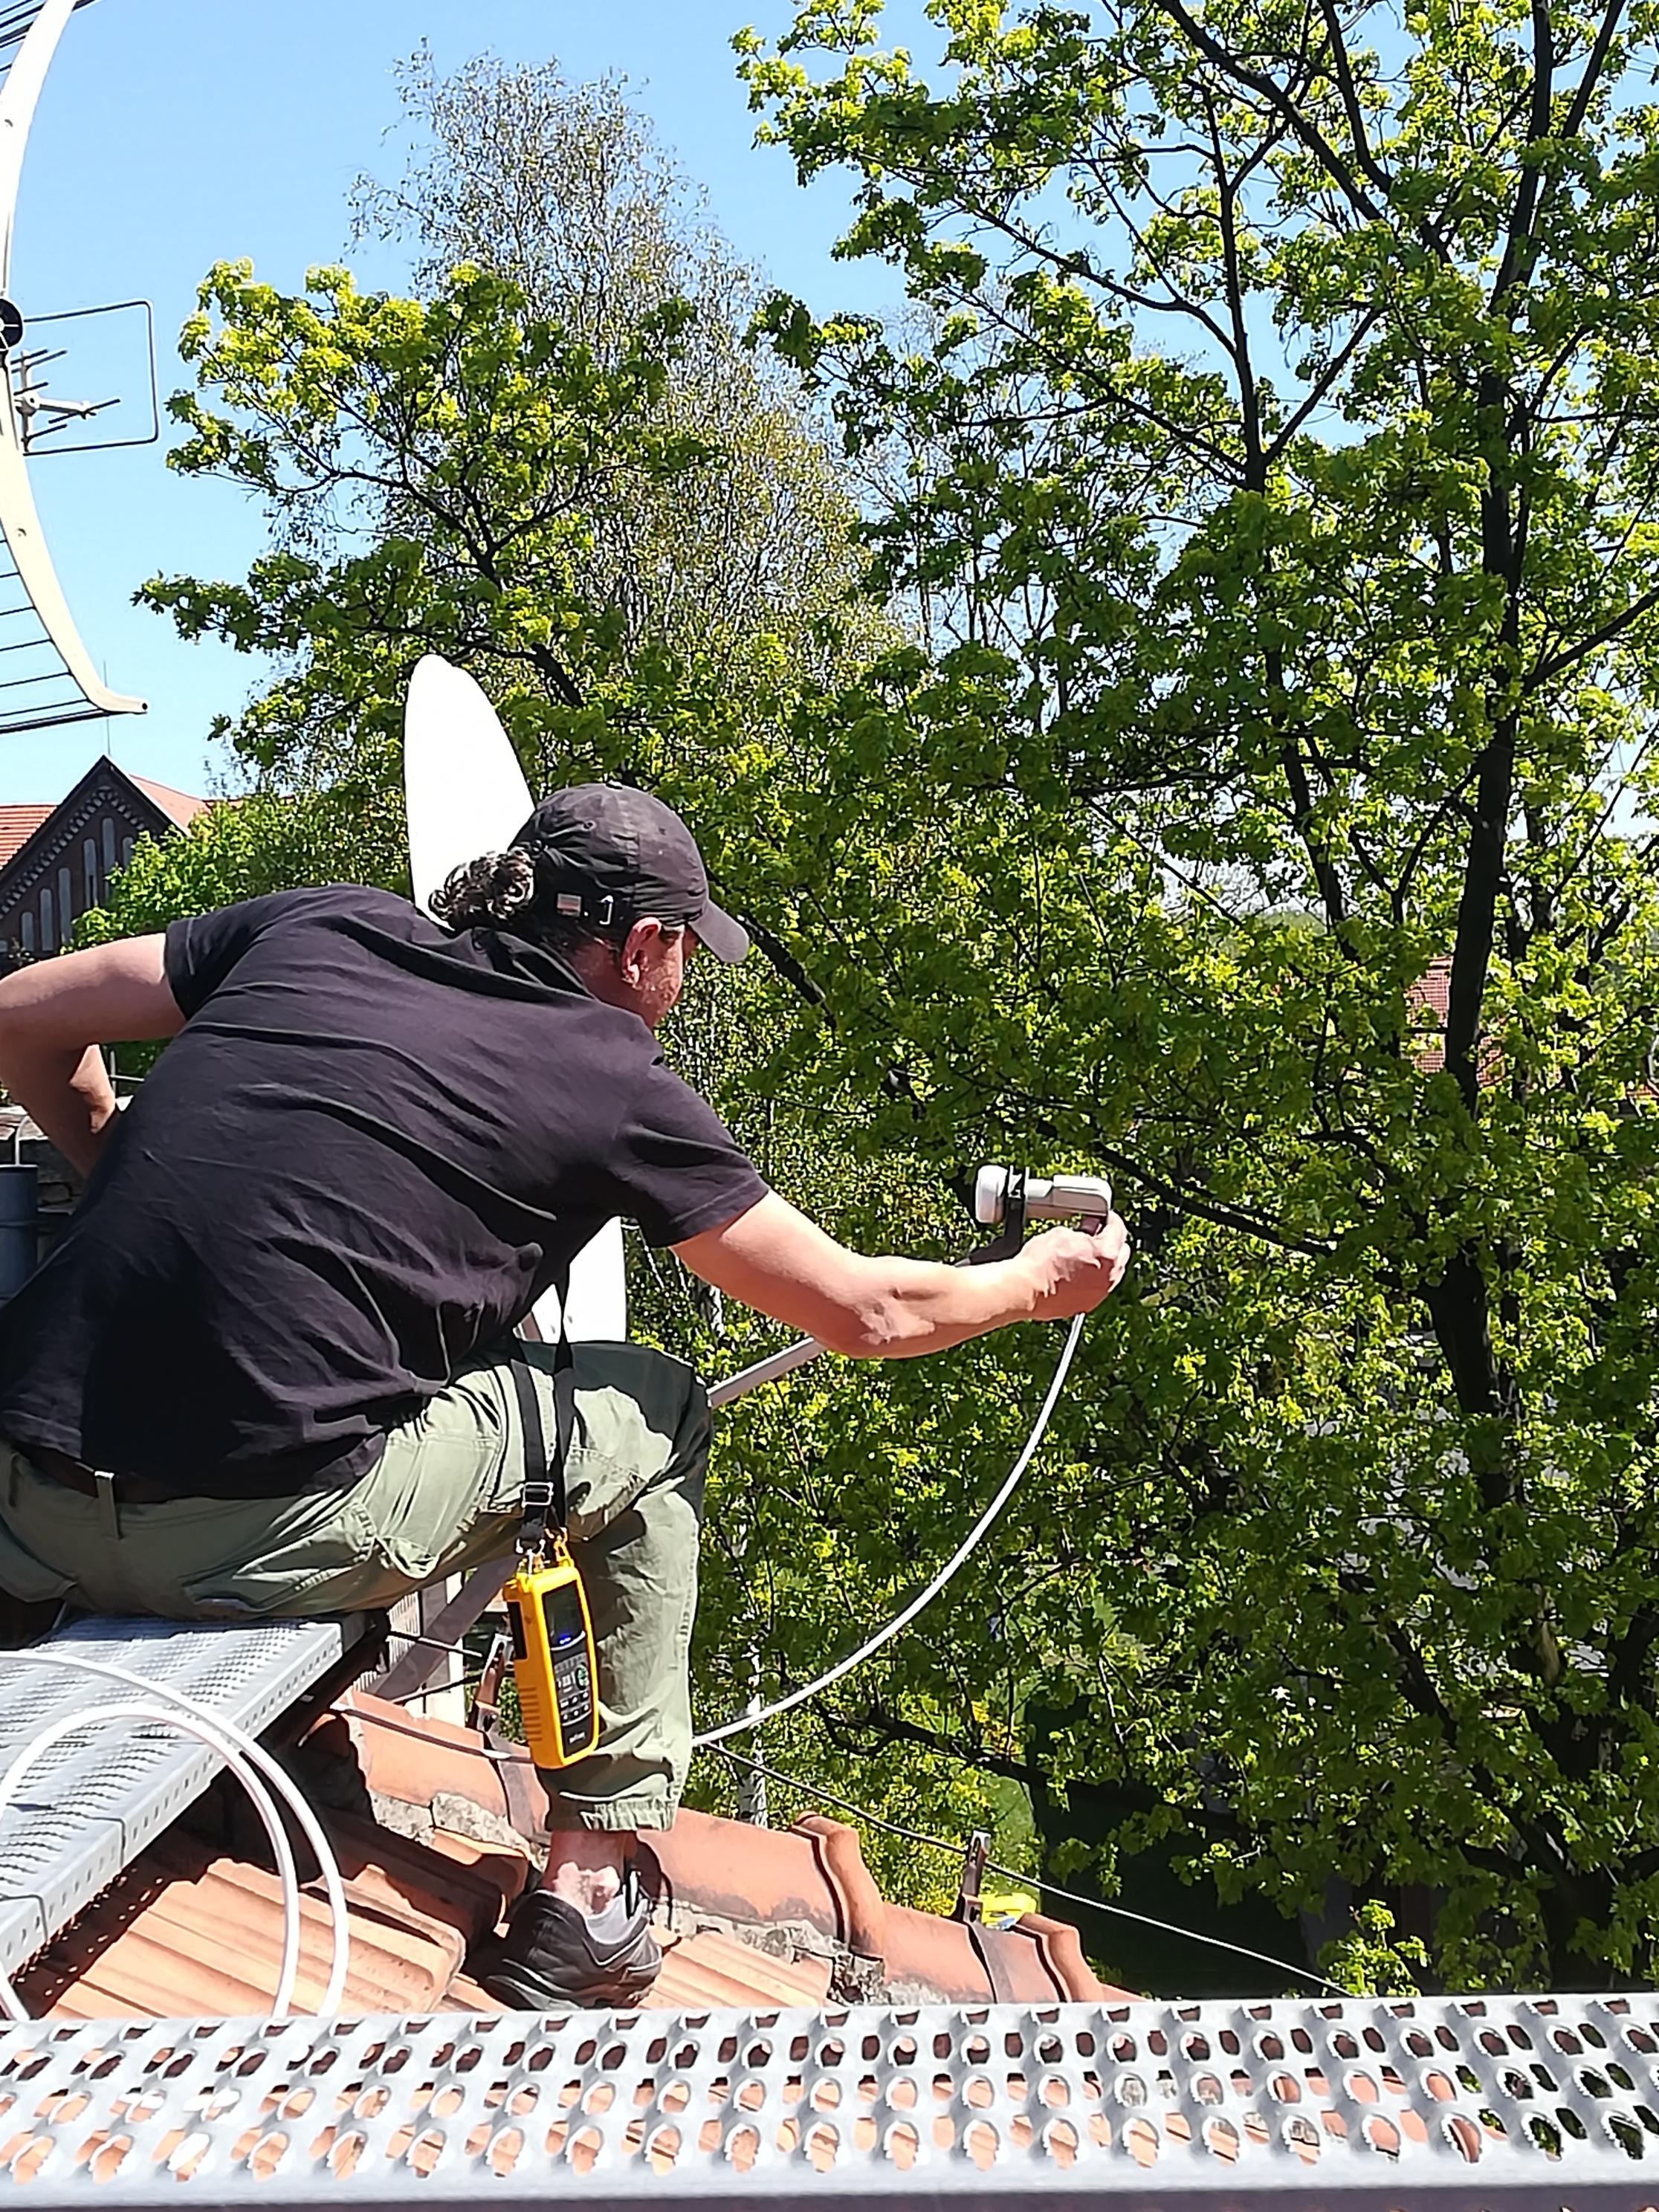 Antena Ruda Sląska